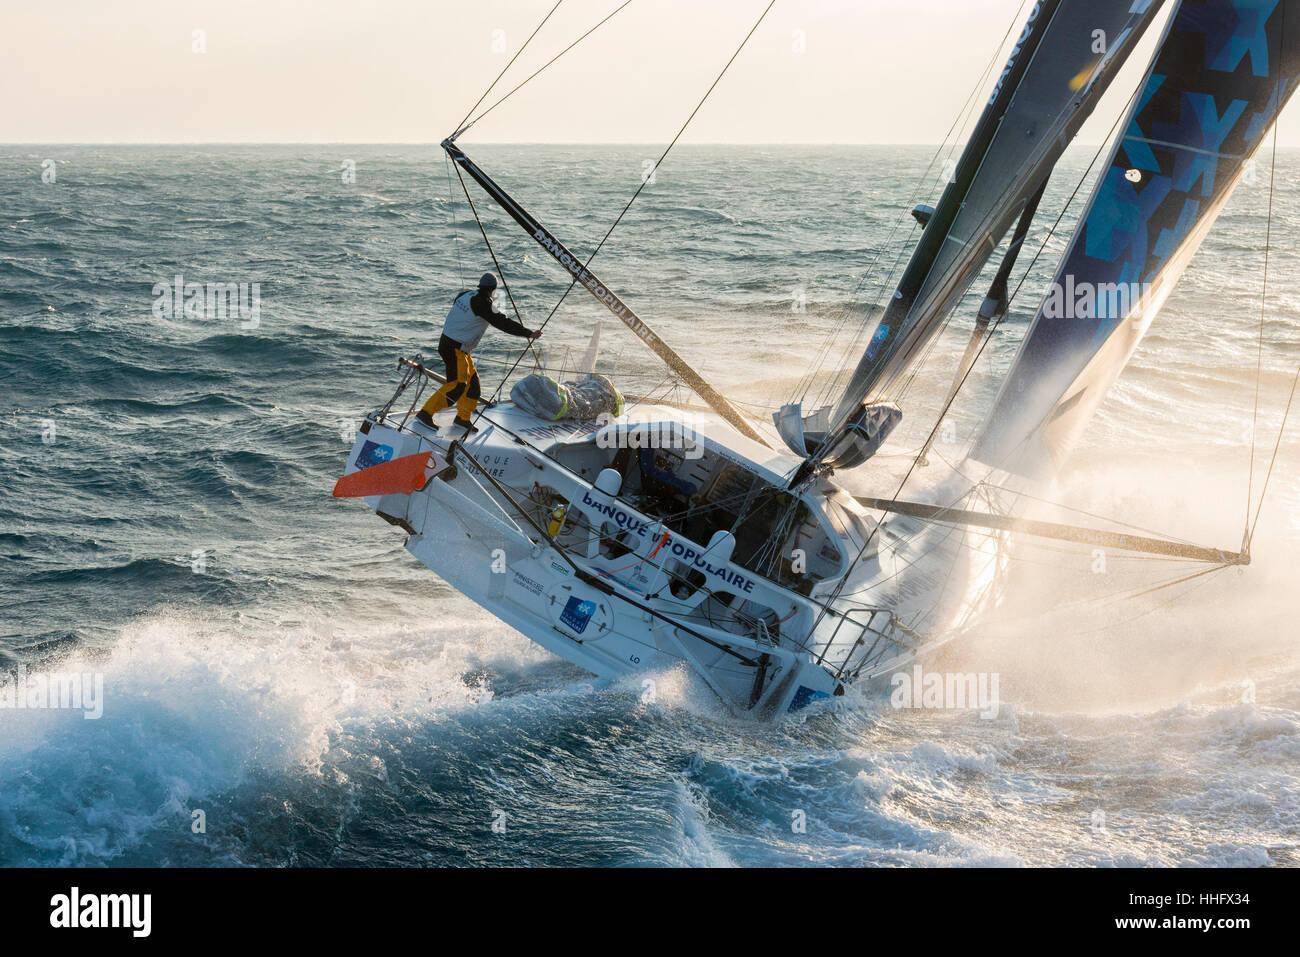 Yacht Race Vendée Globe 2017: armel le cléac'h a bordo do Banque Populaire viii monohull vela (2017/01/19) Imagens de Stock